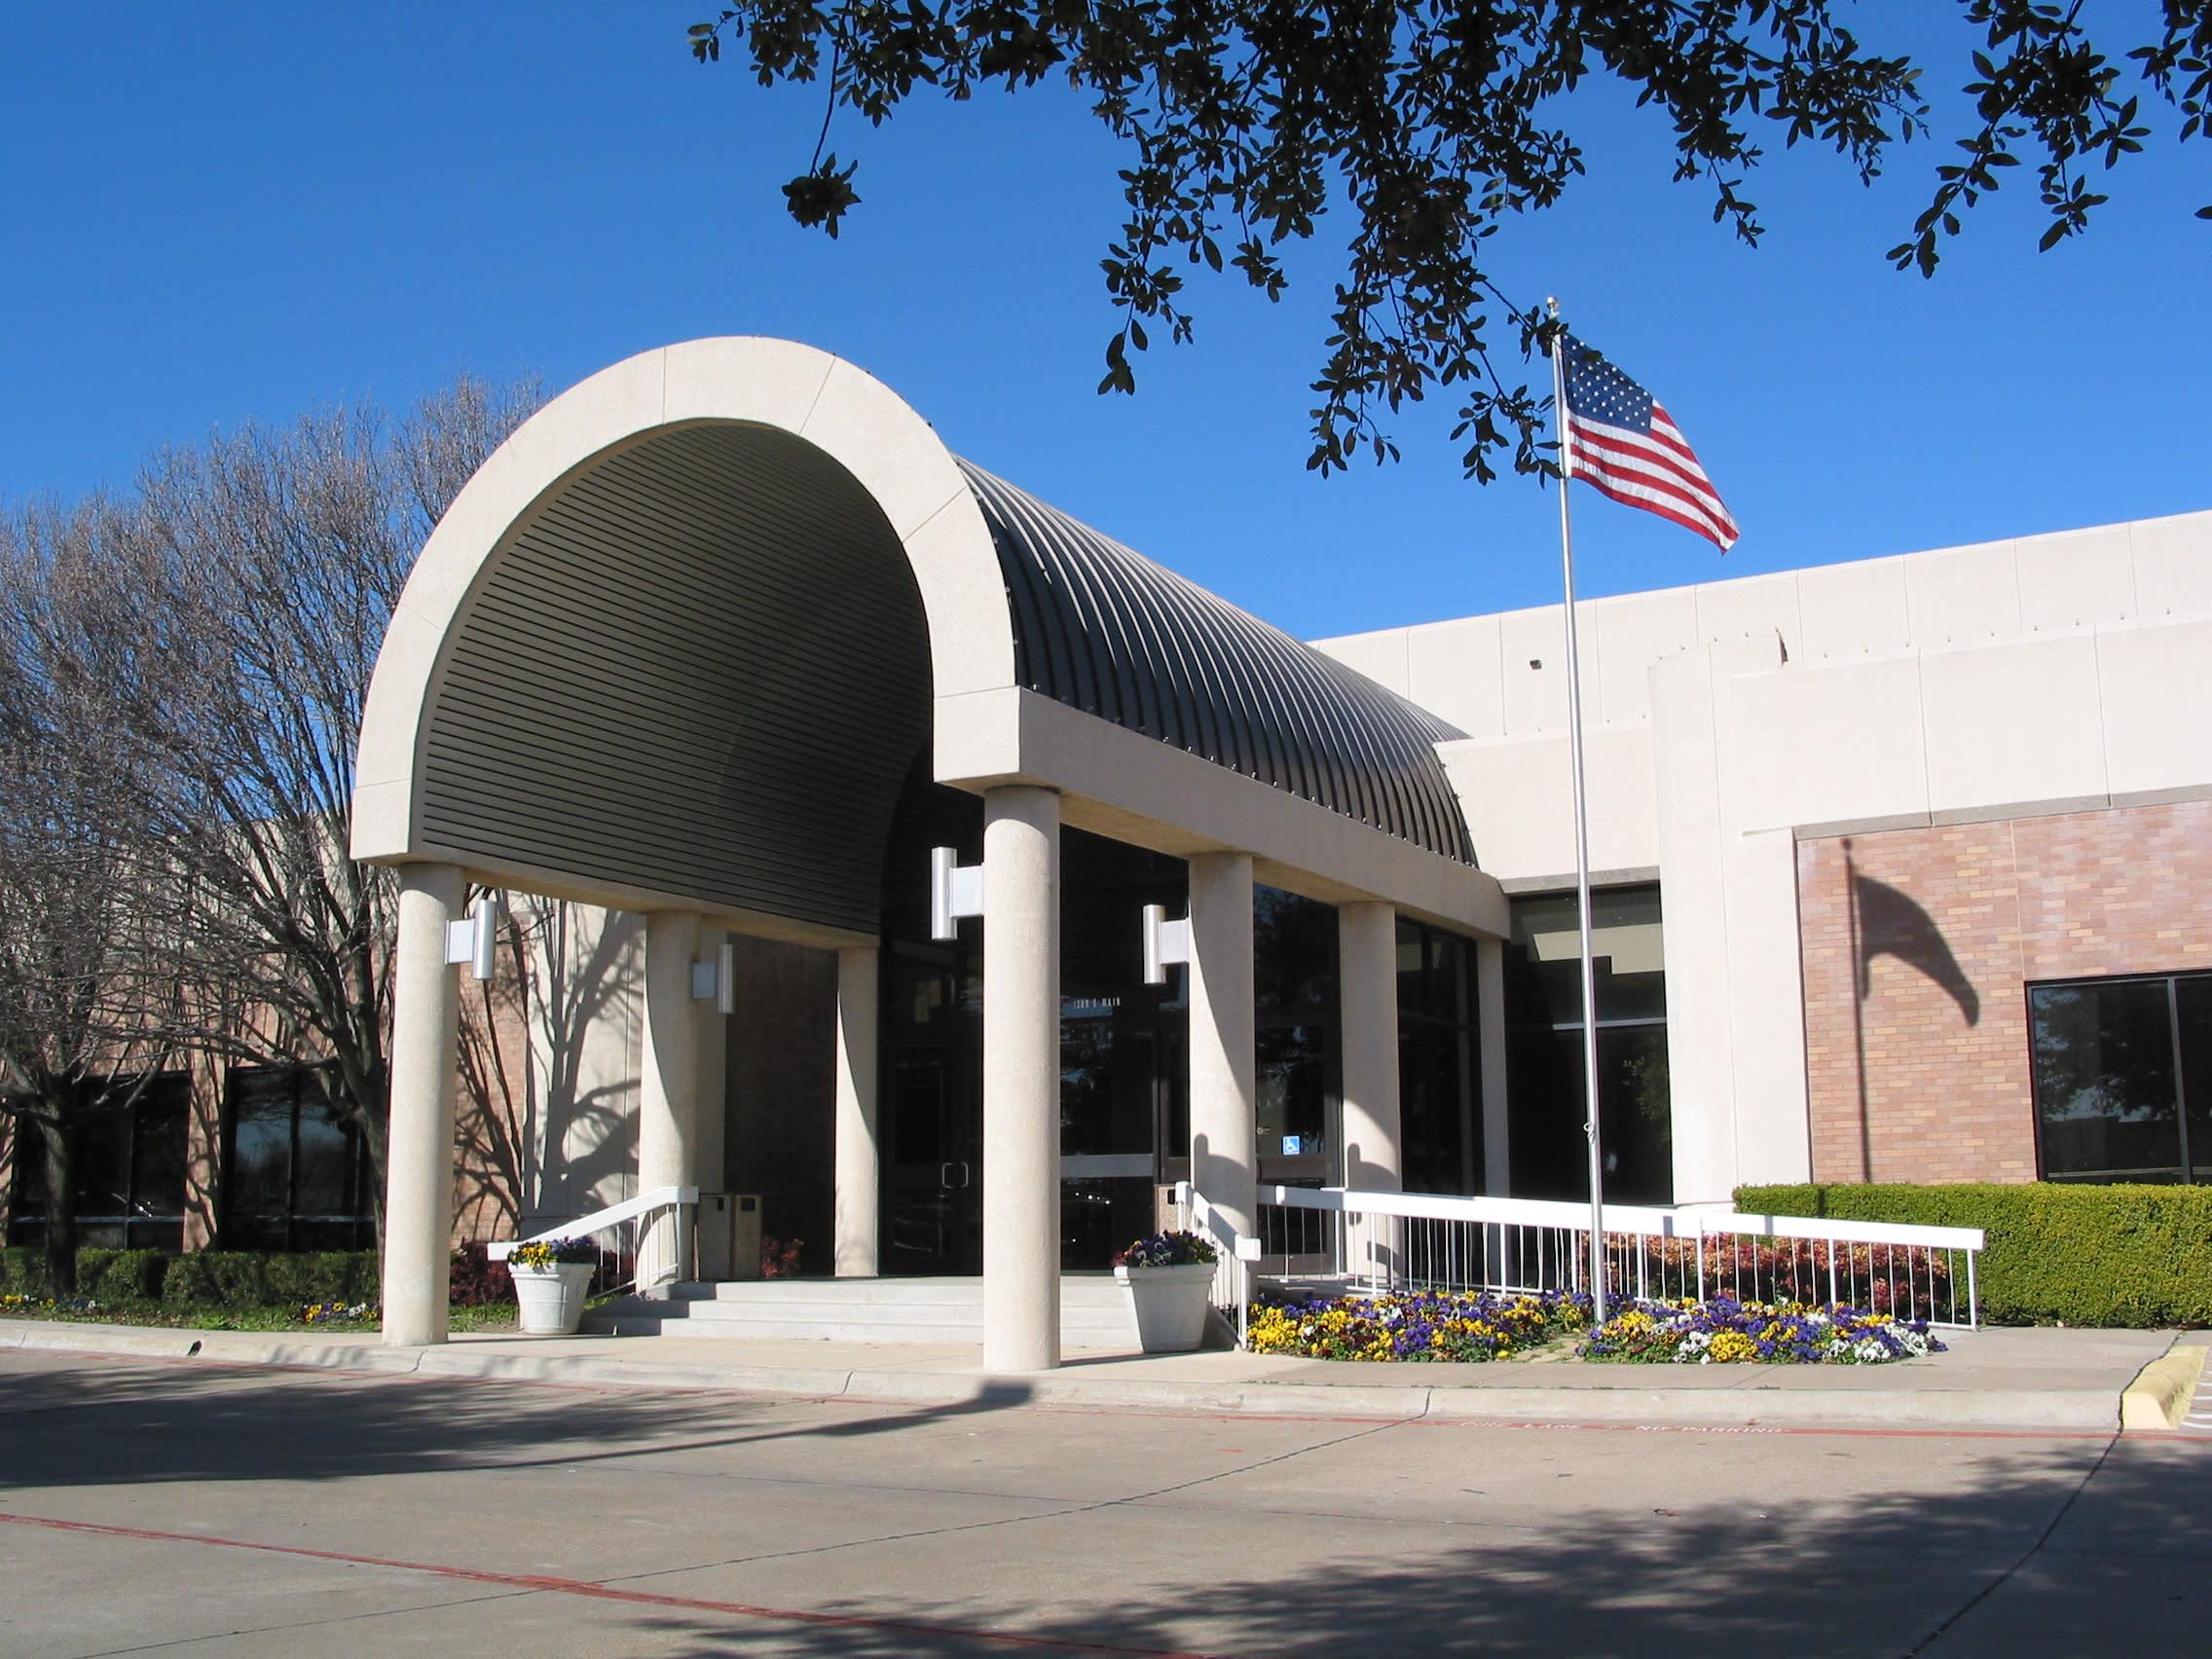 "Képtalálat a következőre: ""Grapevine Convention Center 1209 S. Main Street, Grapevine, Texas,"""